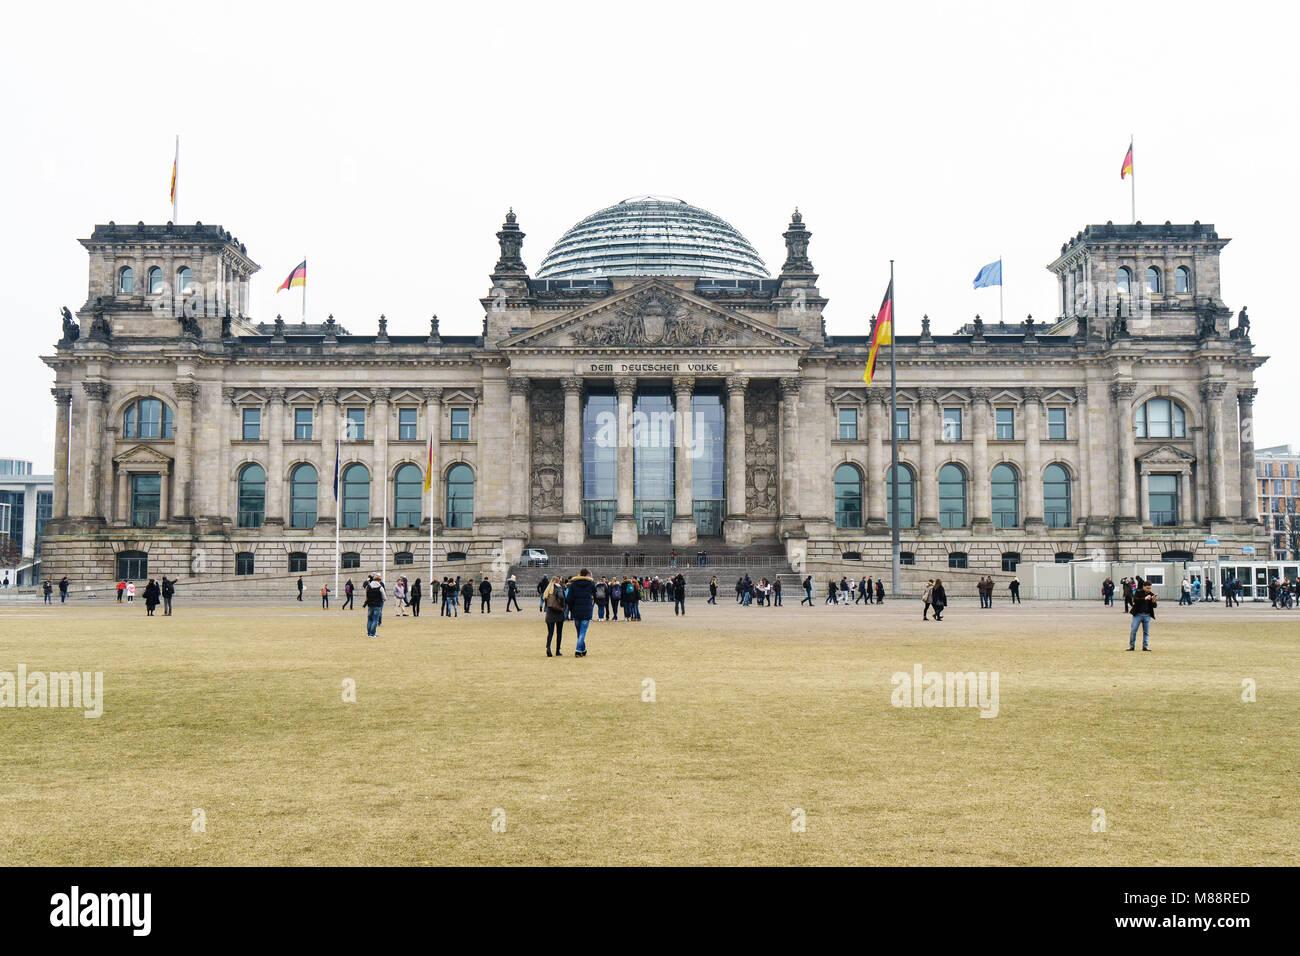 Bundestag german federal parliament building in Berlin Germany - Stock Image